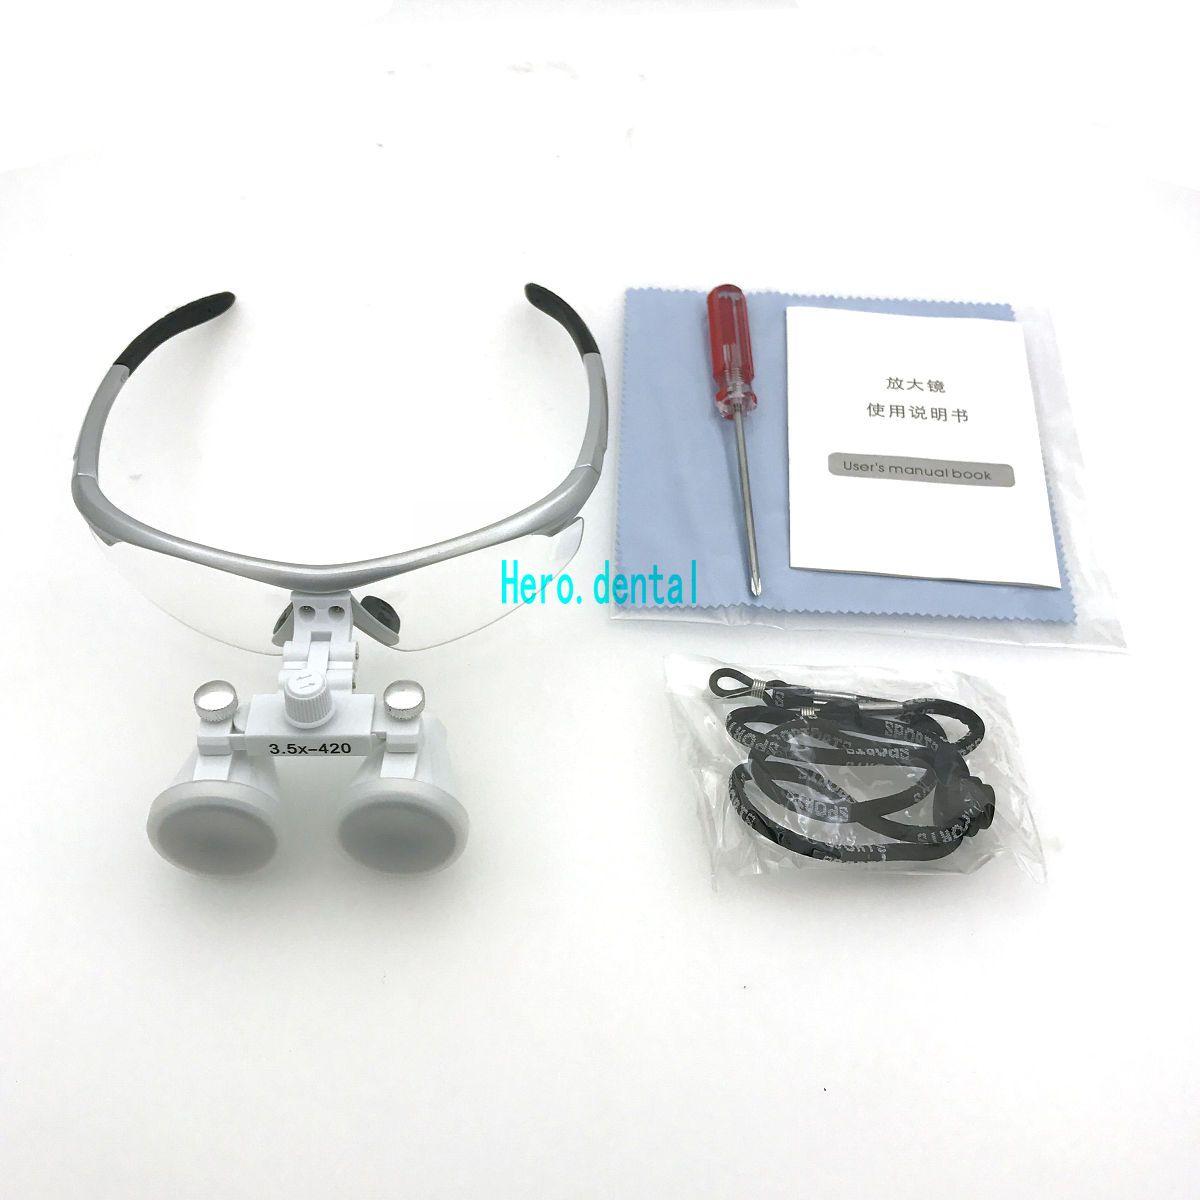 5 Color Dental Loupes Surgical Binocular Loupe dental Magnifier Glasses 3.5x420mm